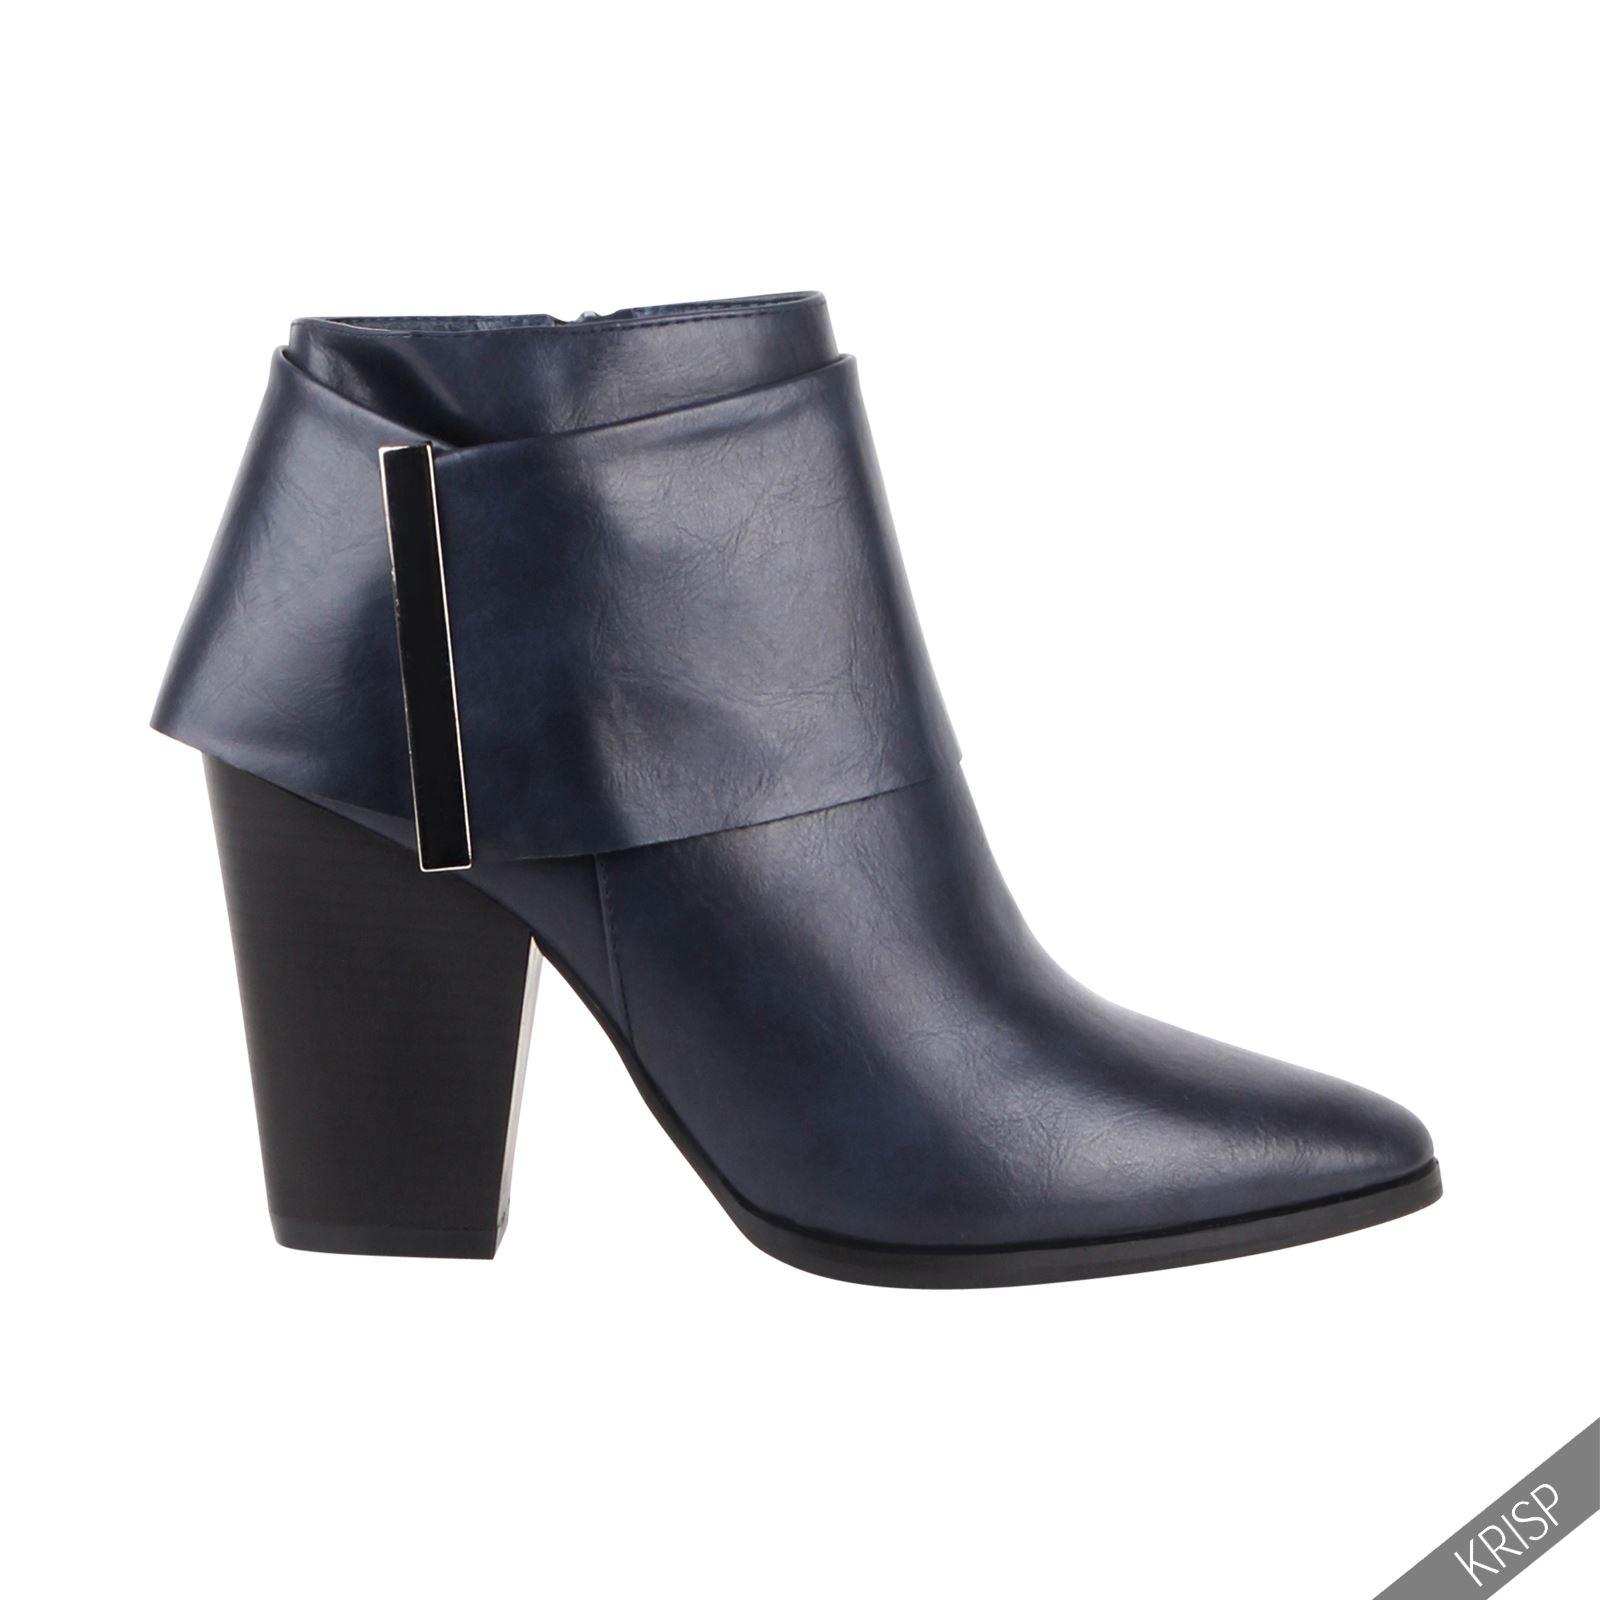 femmes bottines biker rock boots chaussure talon bloc moyen uni cuir bottes sexy ebay. Black Bedroom Furniture Sets. Home Design Ideas